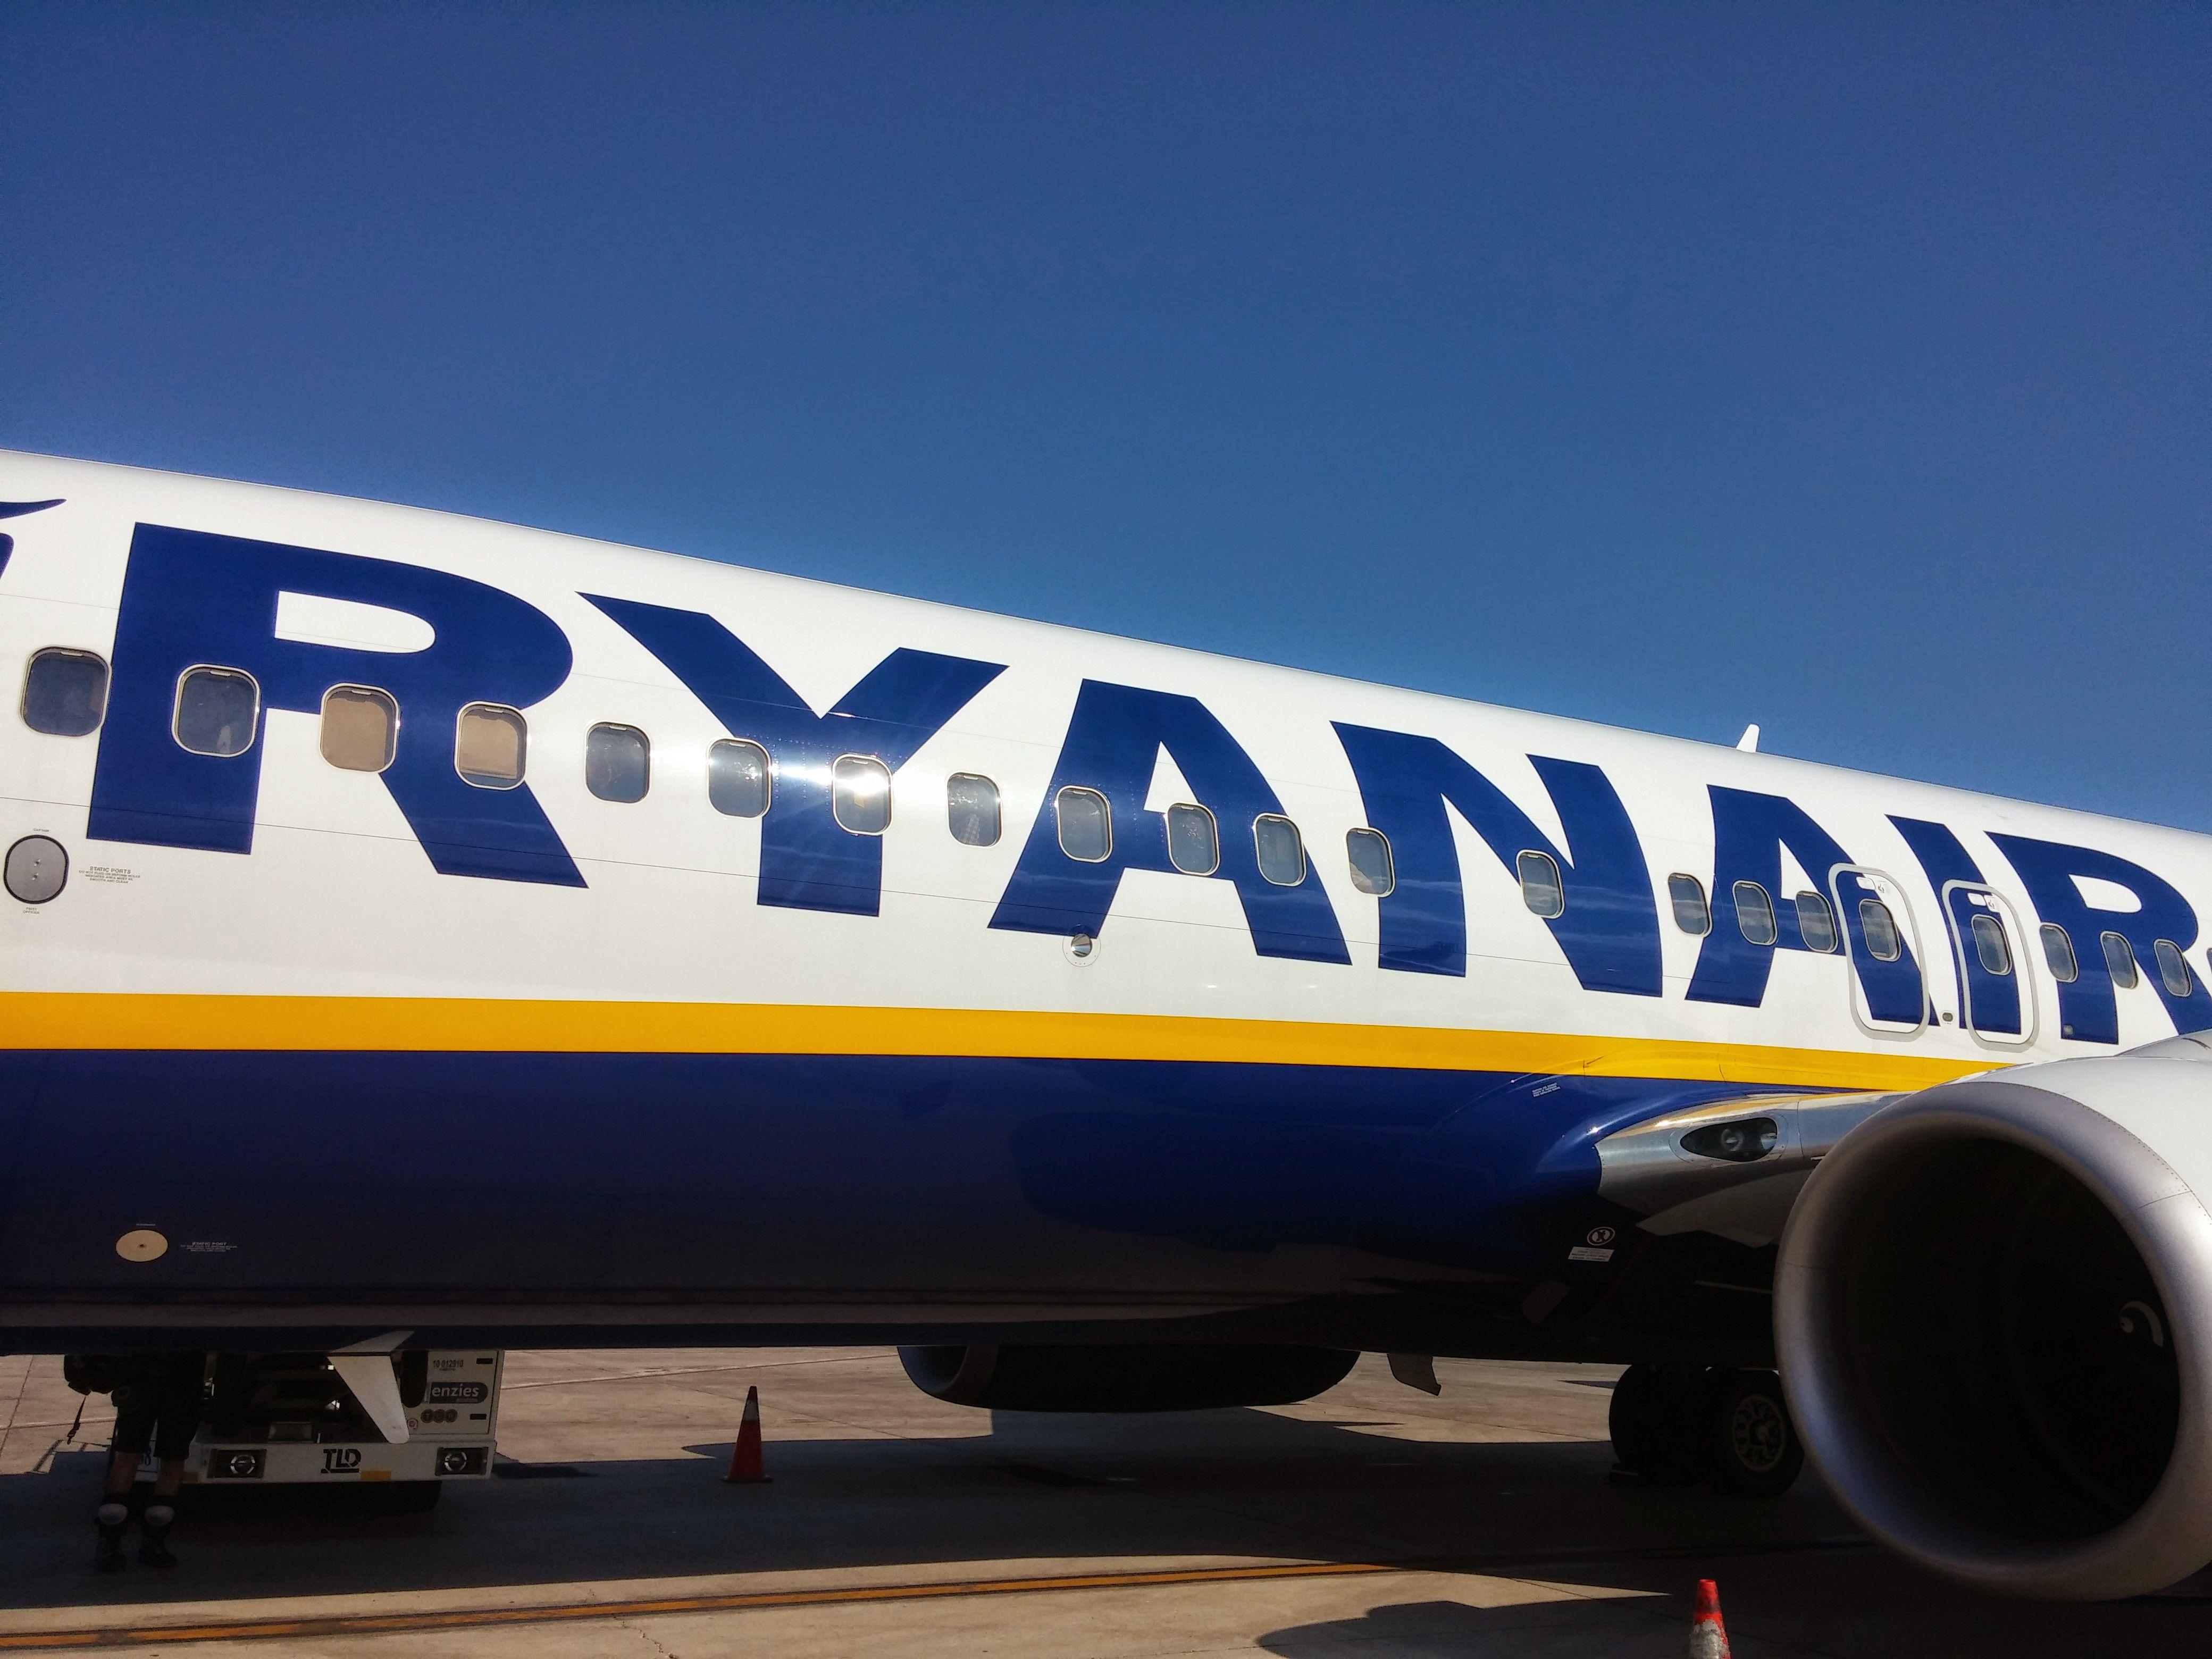 bt ryanair Eu warns ryanair on cancellation reimbursement, compensation reuters staff 1 min read brussels (reuters) - ryanair has to comply with eu passenger rights.